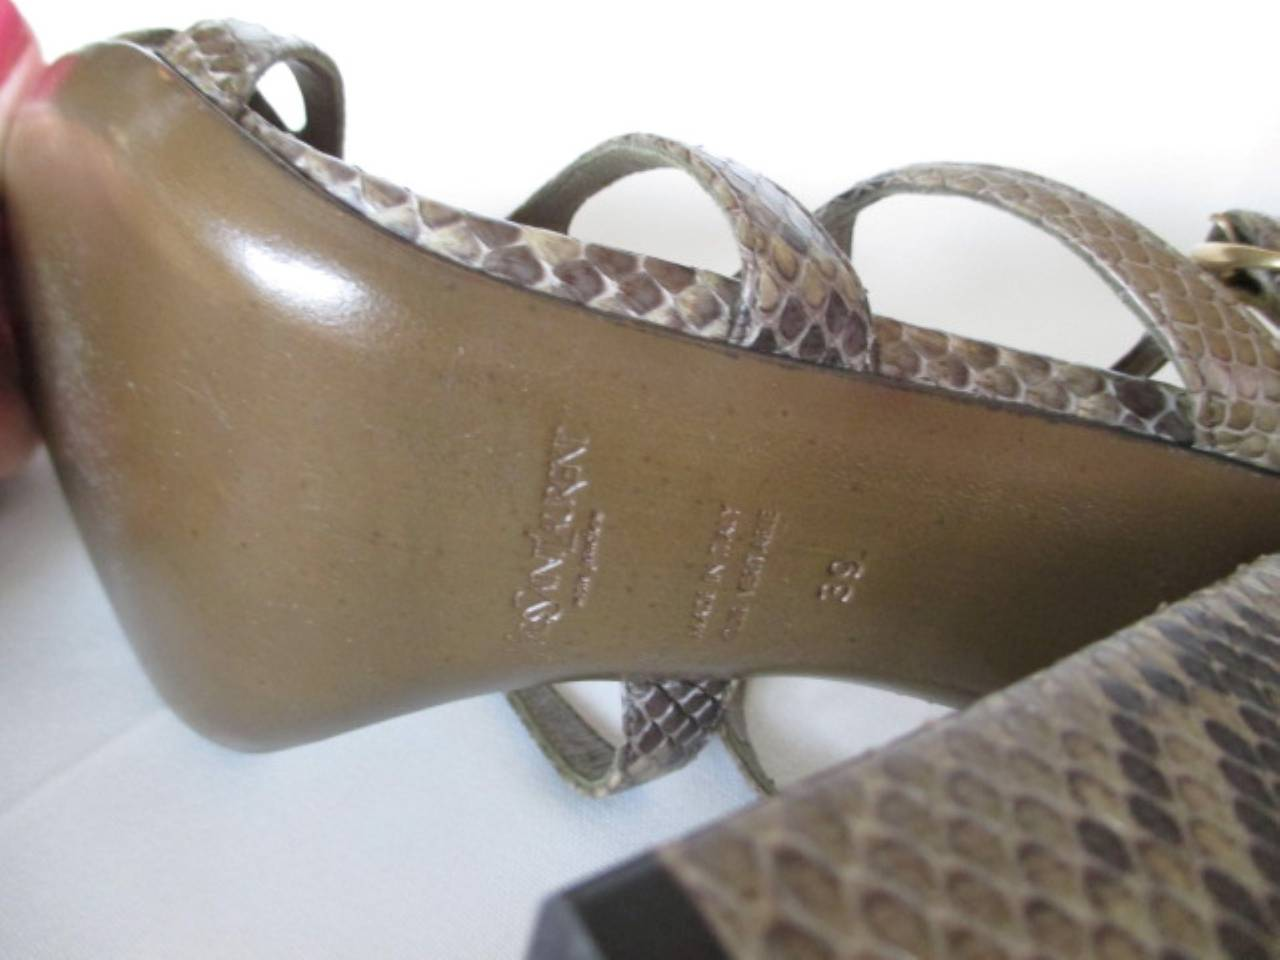 Black Yves saint Laurent snake leather shoes For Sale